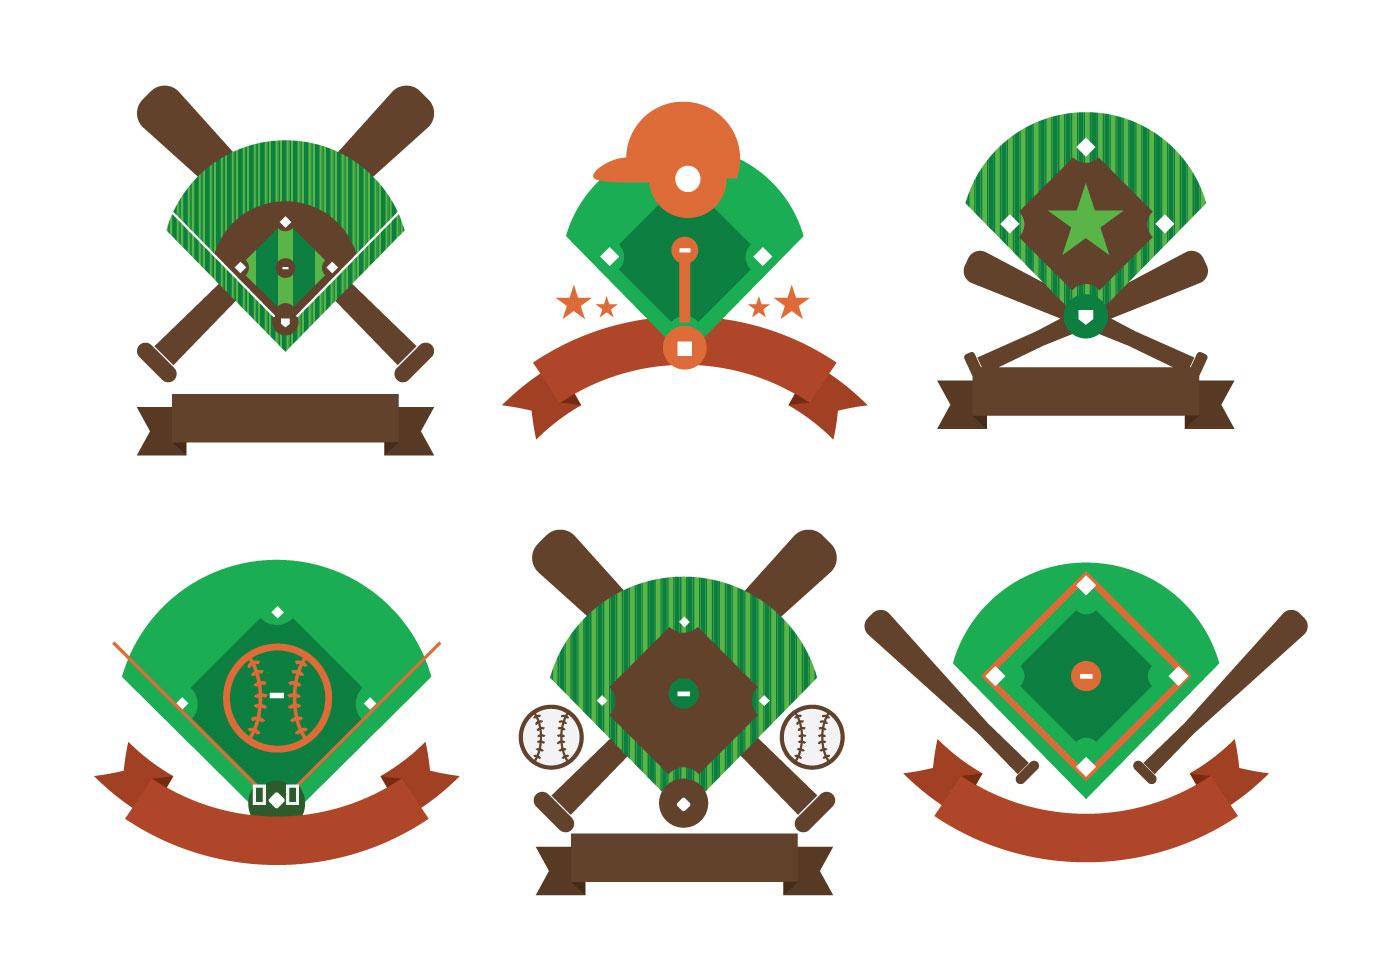 baseball diamond logo free vector art 7981 free downloads rh vecteezy com Baseball Base Vector Baseball Base Vector